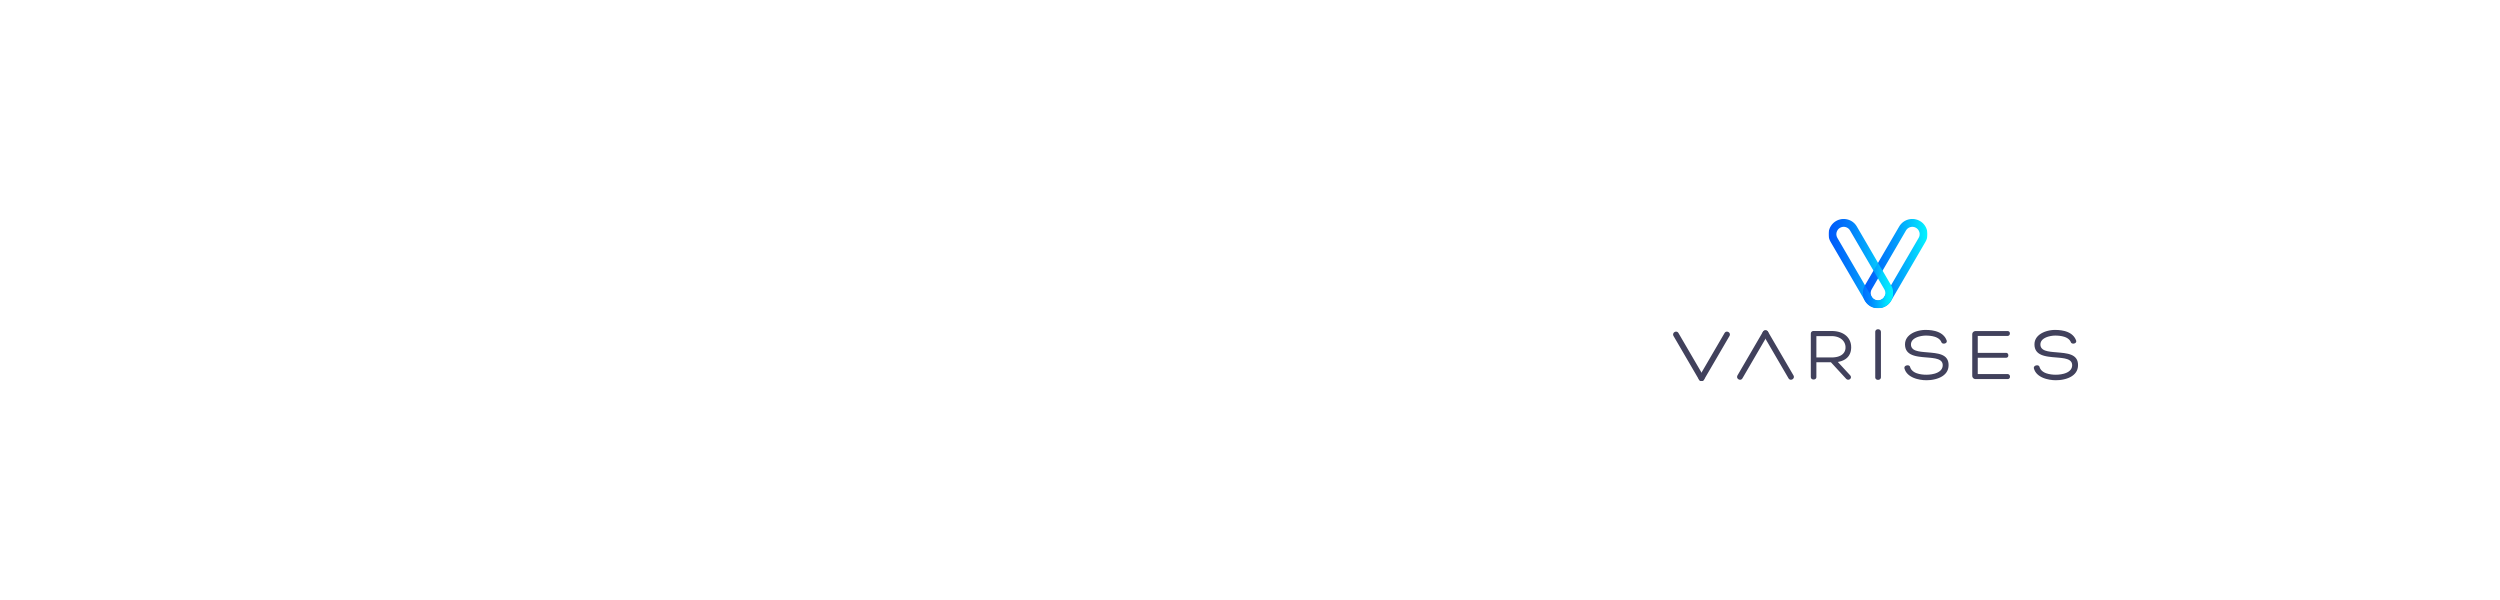 Varises-logos2.png